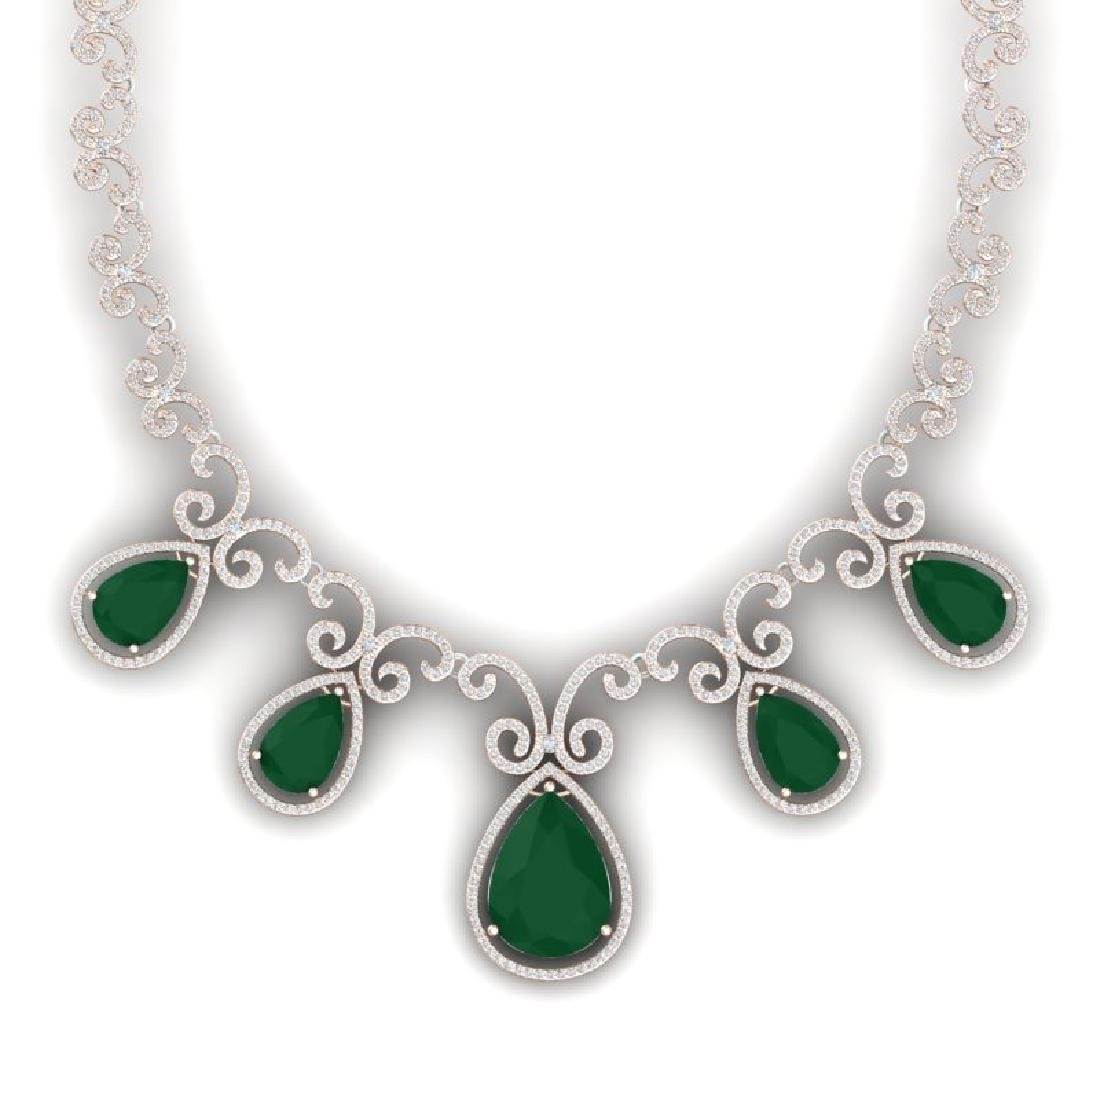 38.42 CTW Royalty Emerald & VS Diamond Necklace 18K